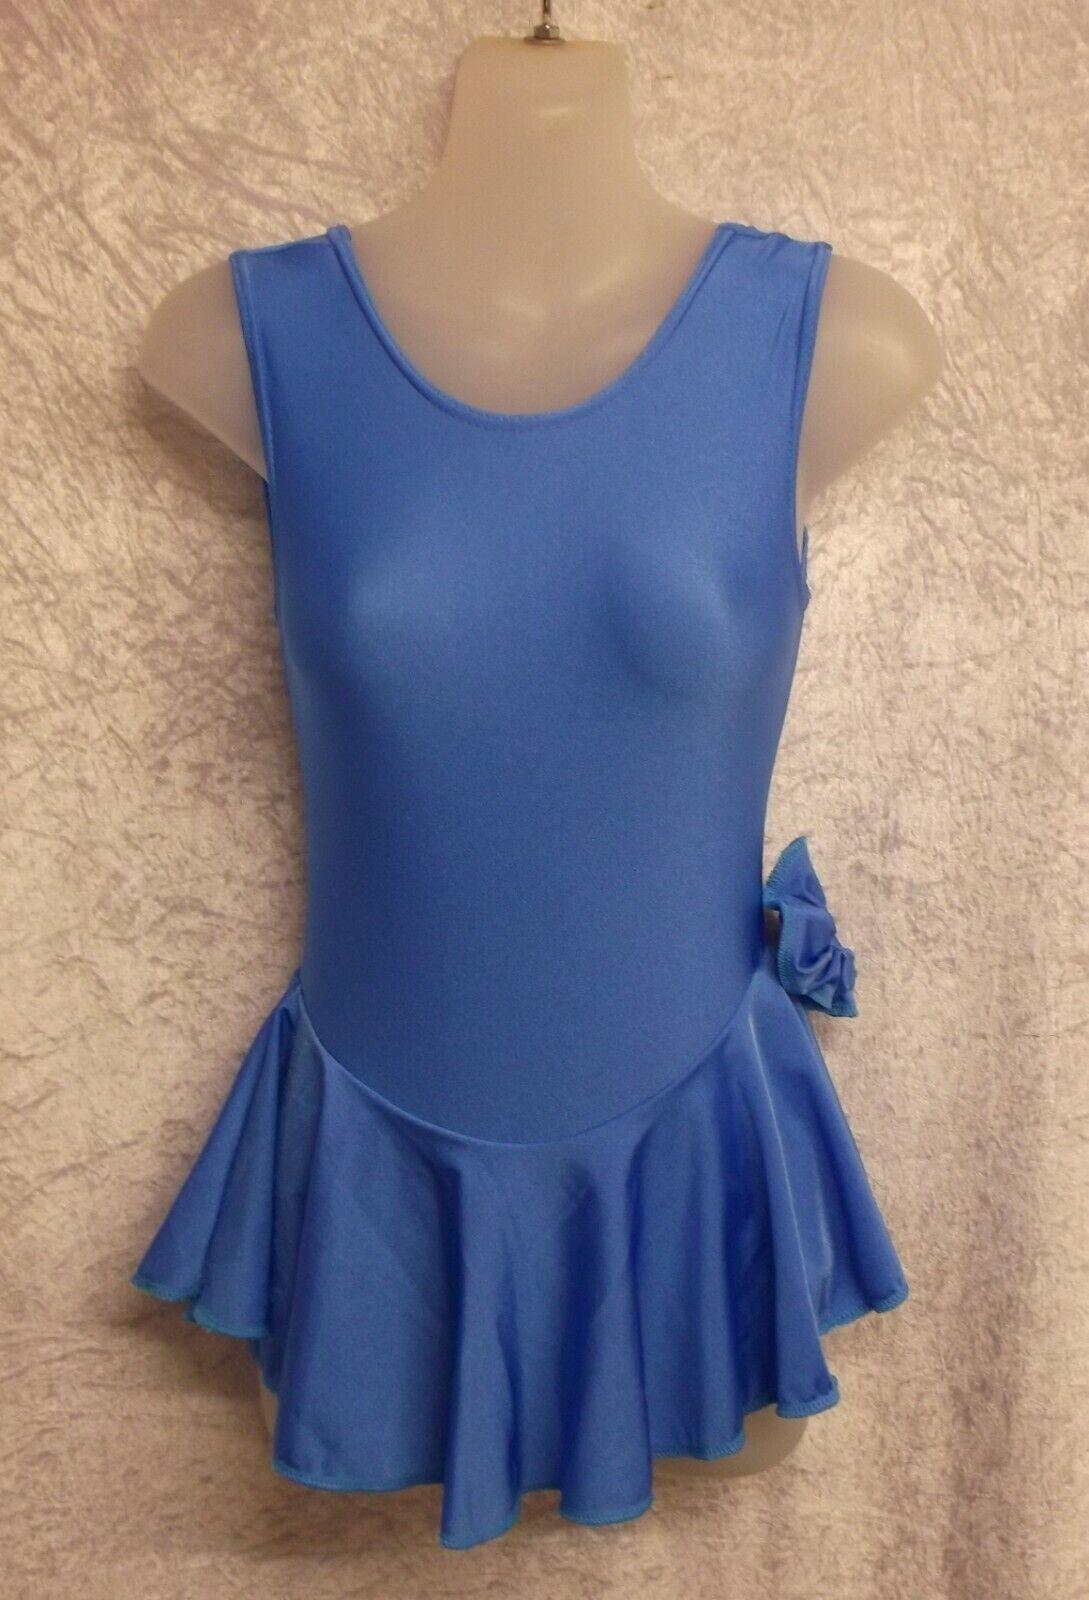 MID BLUE LYCRA SLEEVELESS SKATE DRESS LEOTARD - 7-8 YEARS YEARS MAJORETTES